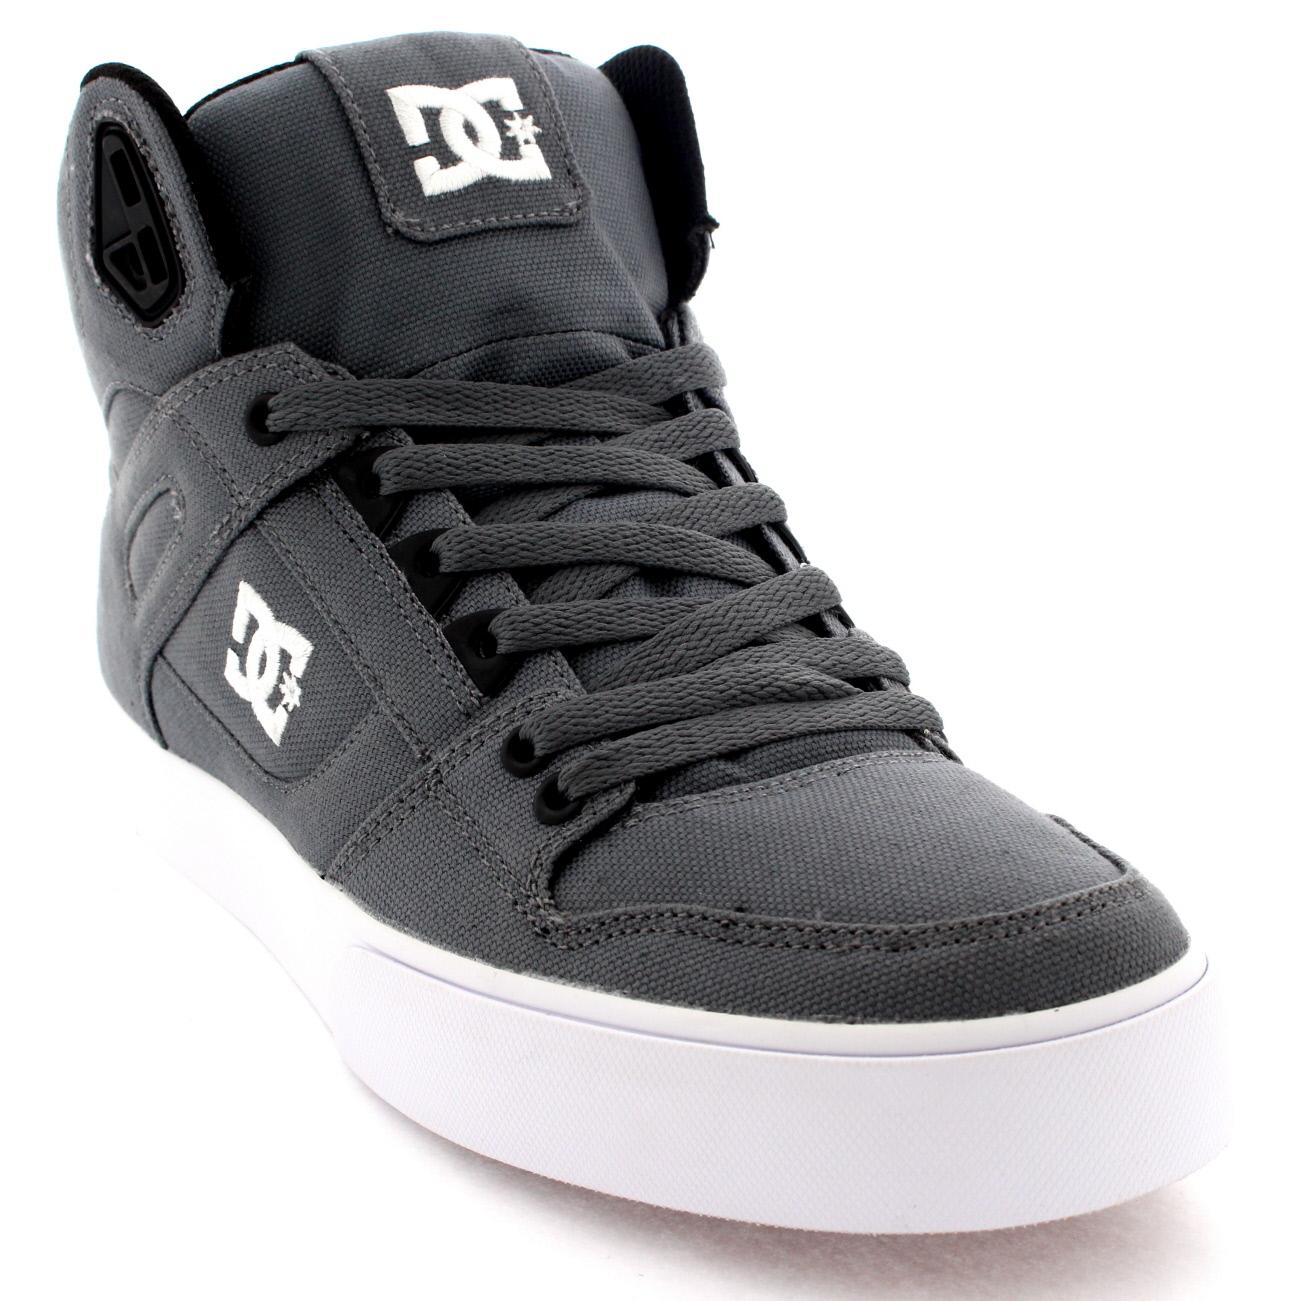 Mens Dc Skate Shoes Size